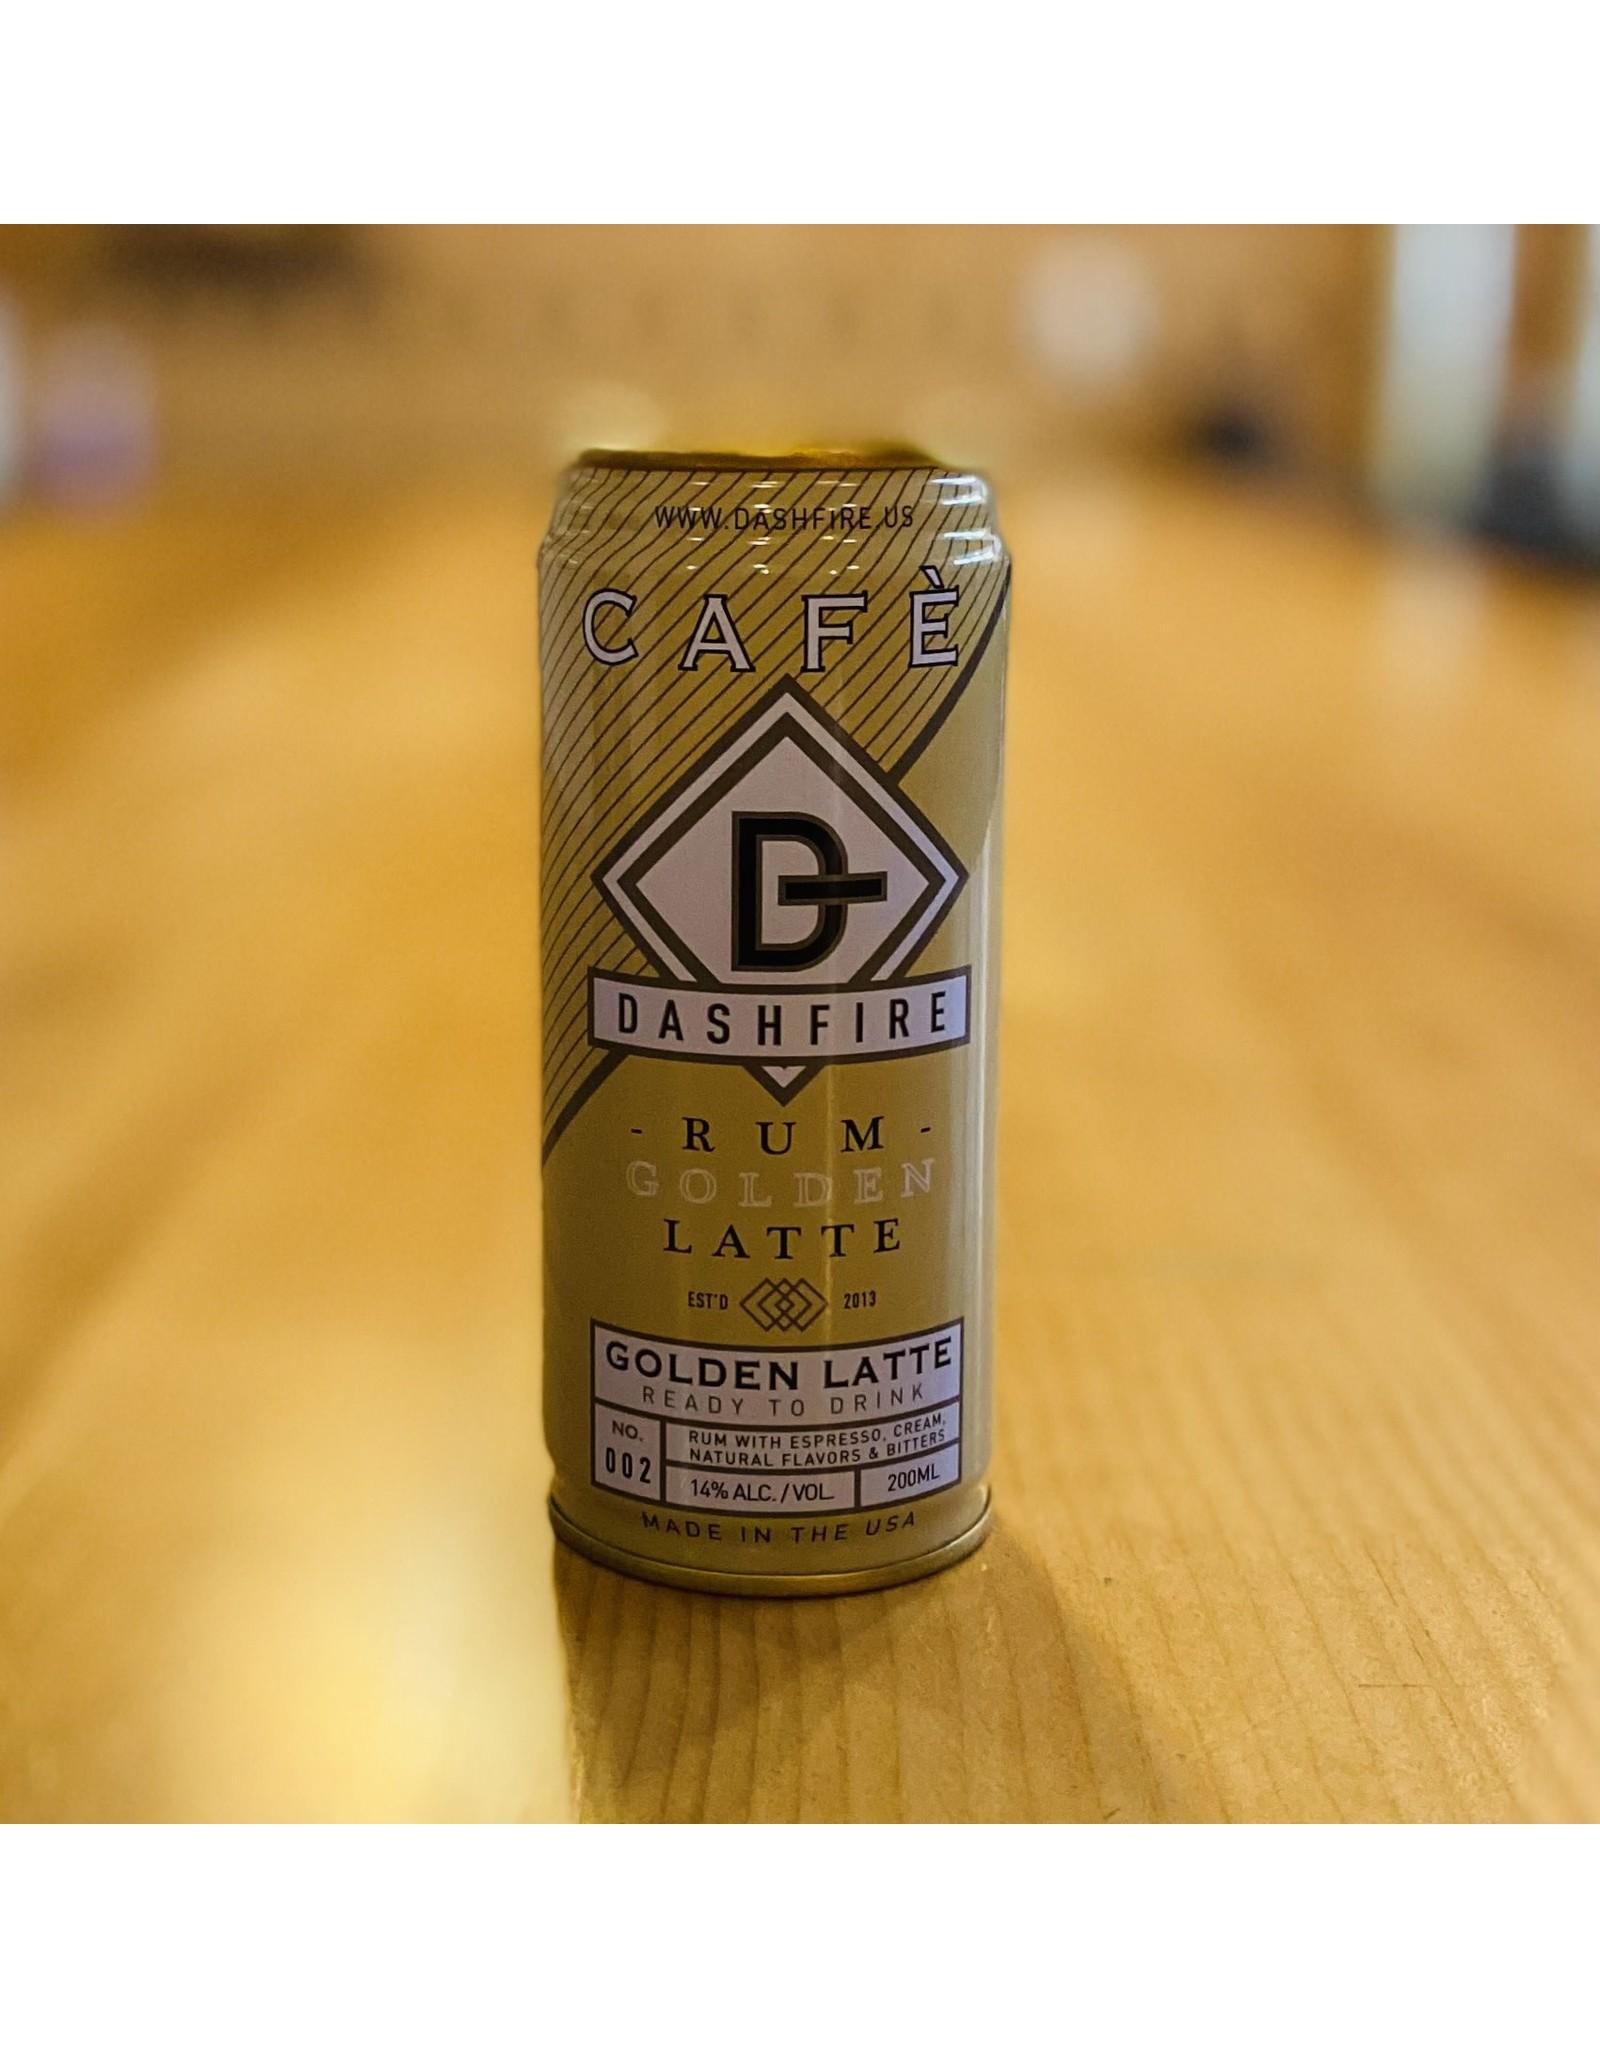 "Dashfire ""Cafe"" Golden Latte Rum RTD Cocktail 200ml - Minnetonka, Minnesota"